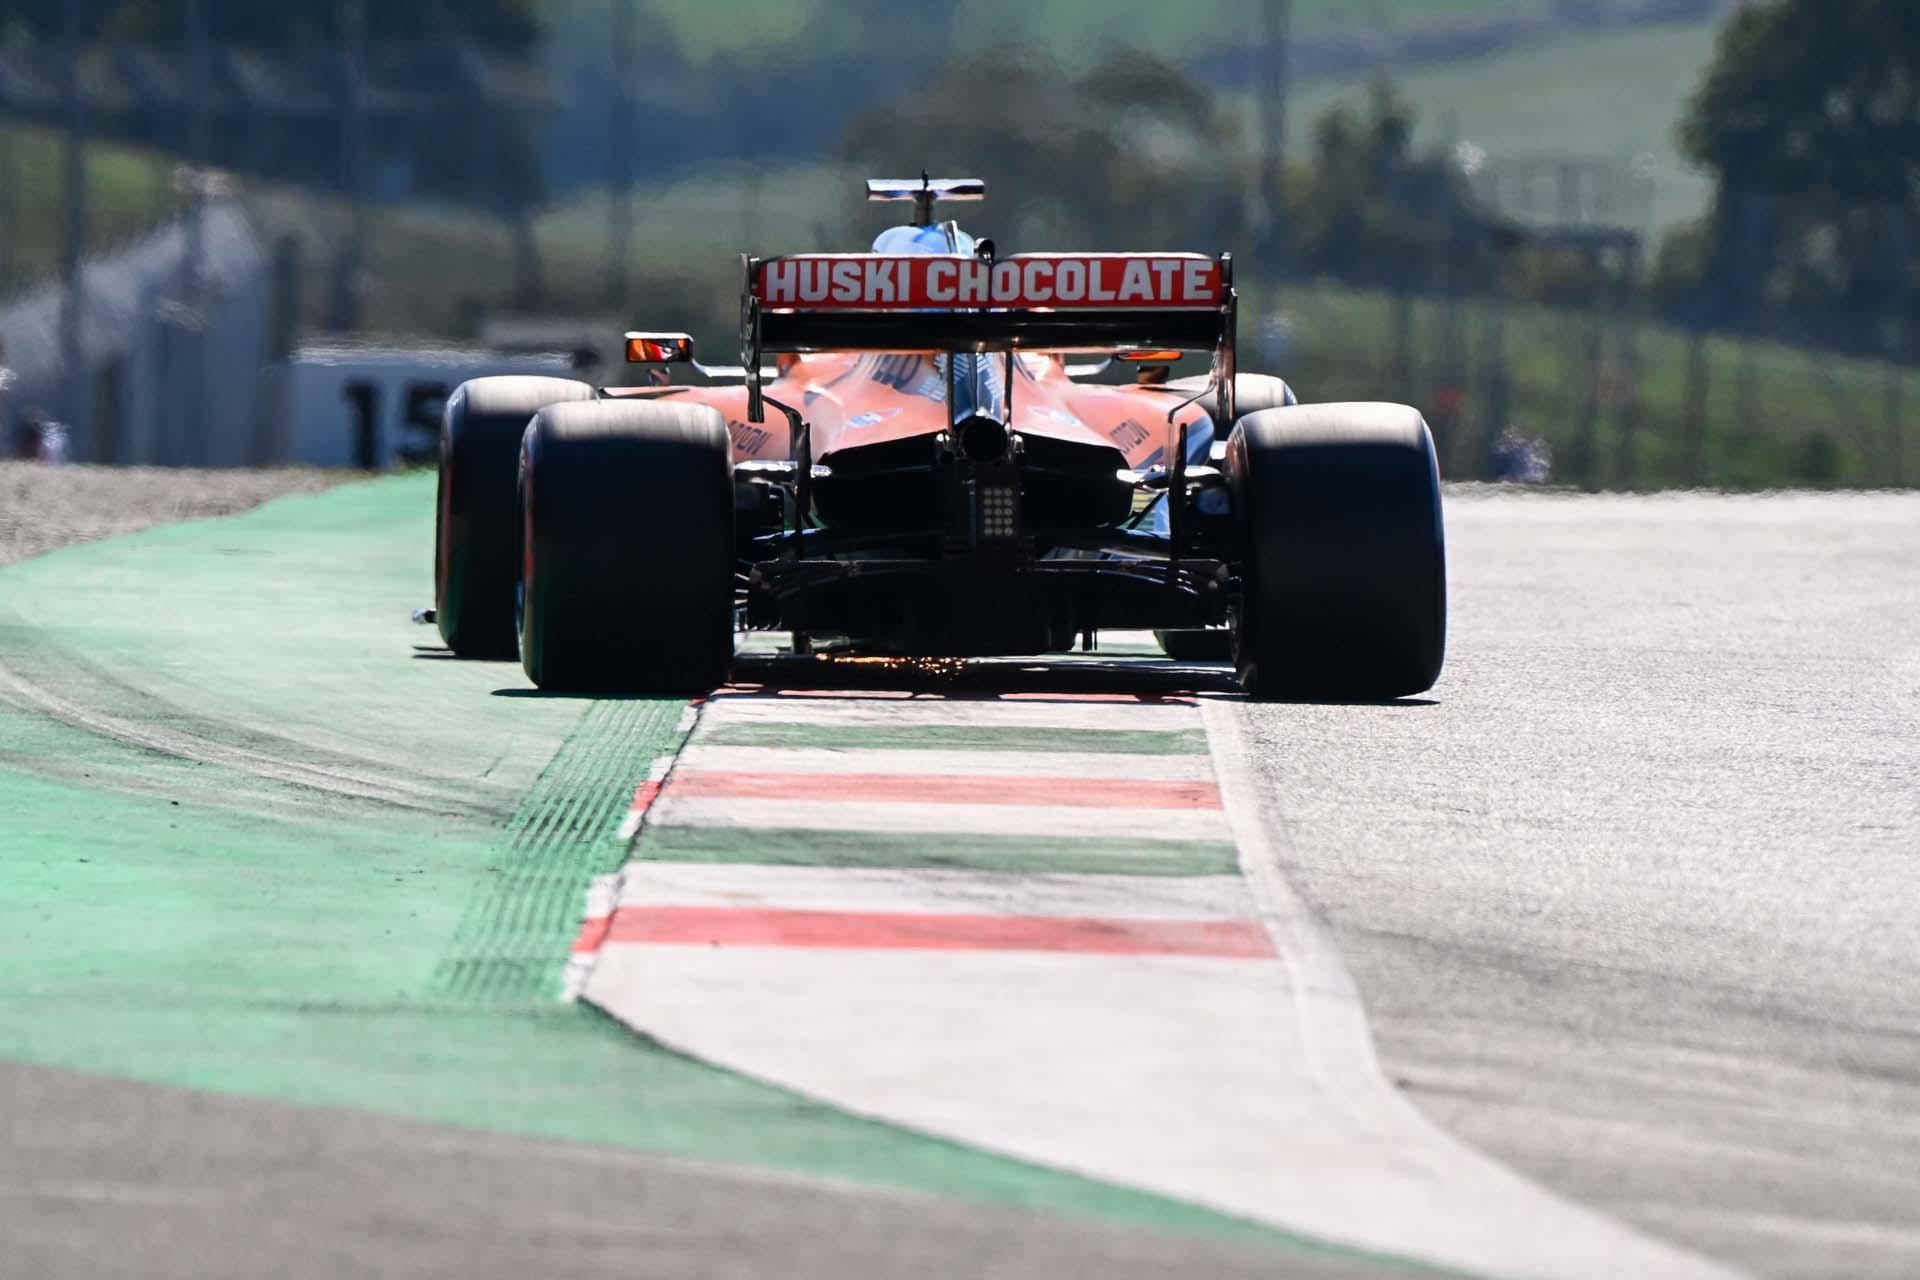 Carlos Sainz, McLaren MCL35, runs over a kerb exiting a corner